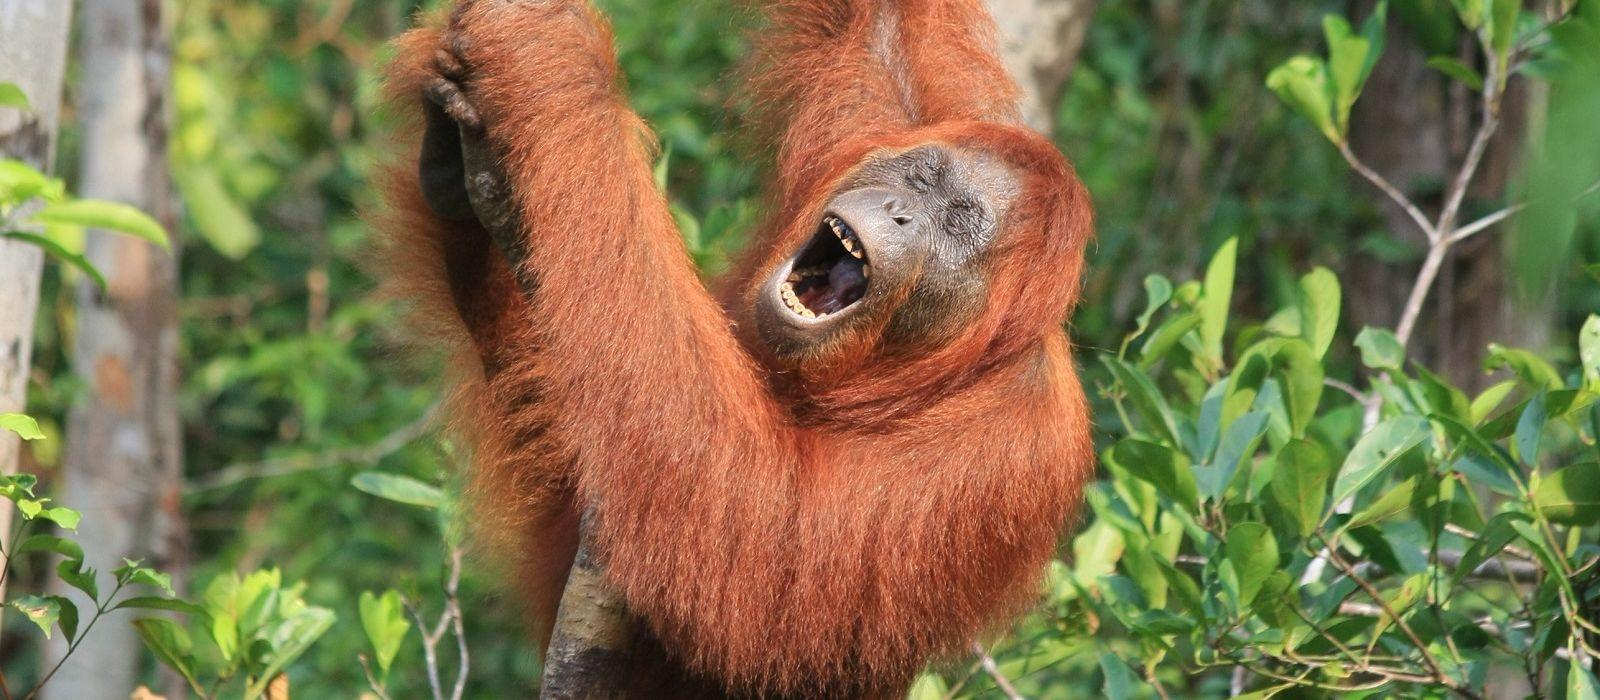 Reiseziel Borneo, Tanjung Puting National Park Indonesien